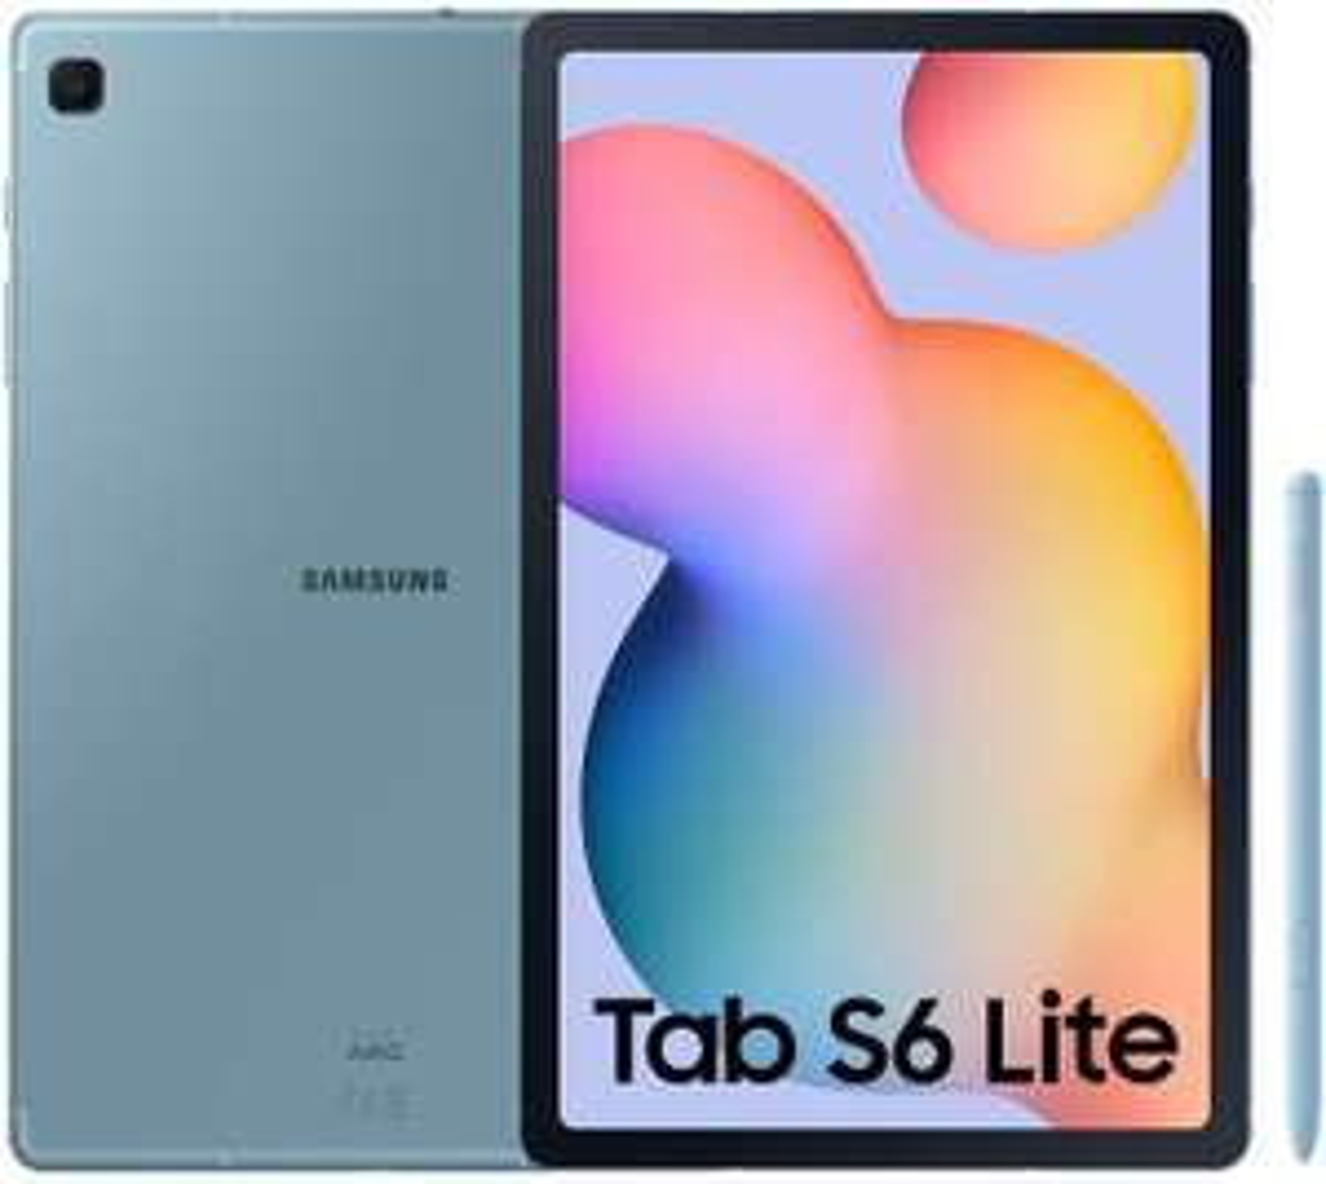 "Samsung Tab S6 Lite 4/128GB 10,4"" FHD Tablet inkl. S-Pen (7.040 mAh, Exynos 9611, 180K AnTuTu, IPS, GPS, USB-C, WiFi) in Blau oder Grau"